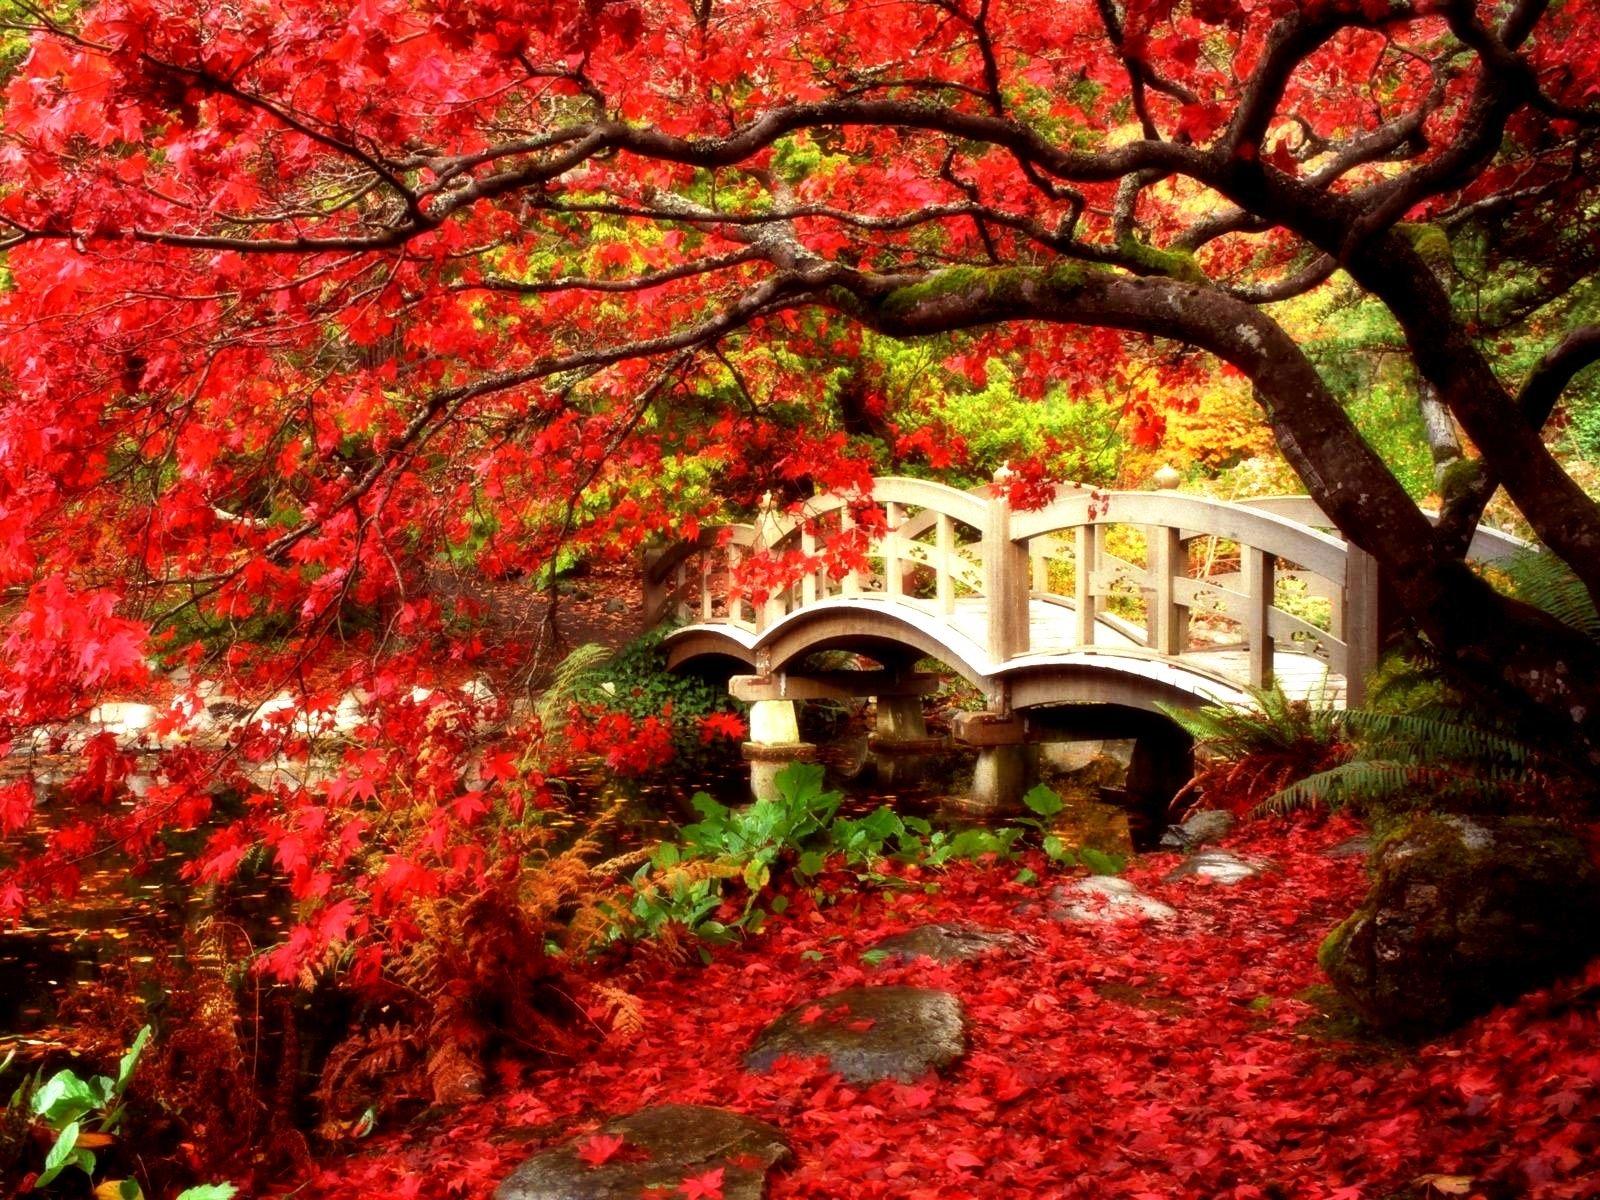 Man Made - Bridge  Artistic Leaf Maple Tree Tree Canada British Columbia Fall Garden Japanese Garden Foliage Red Wallpaper